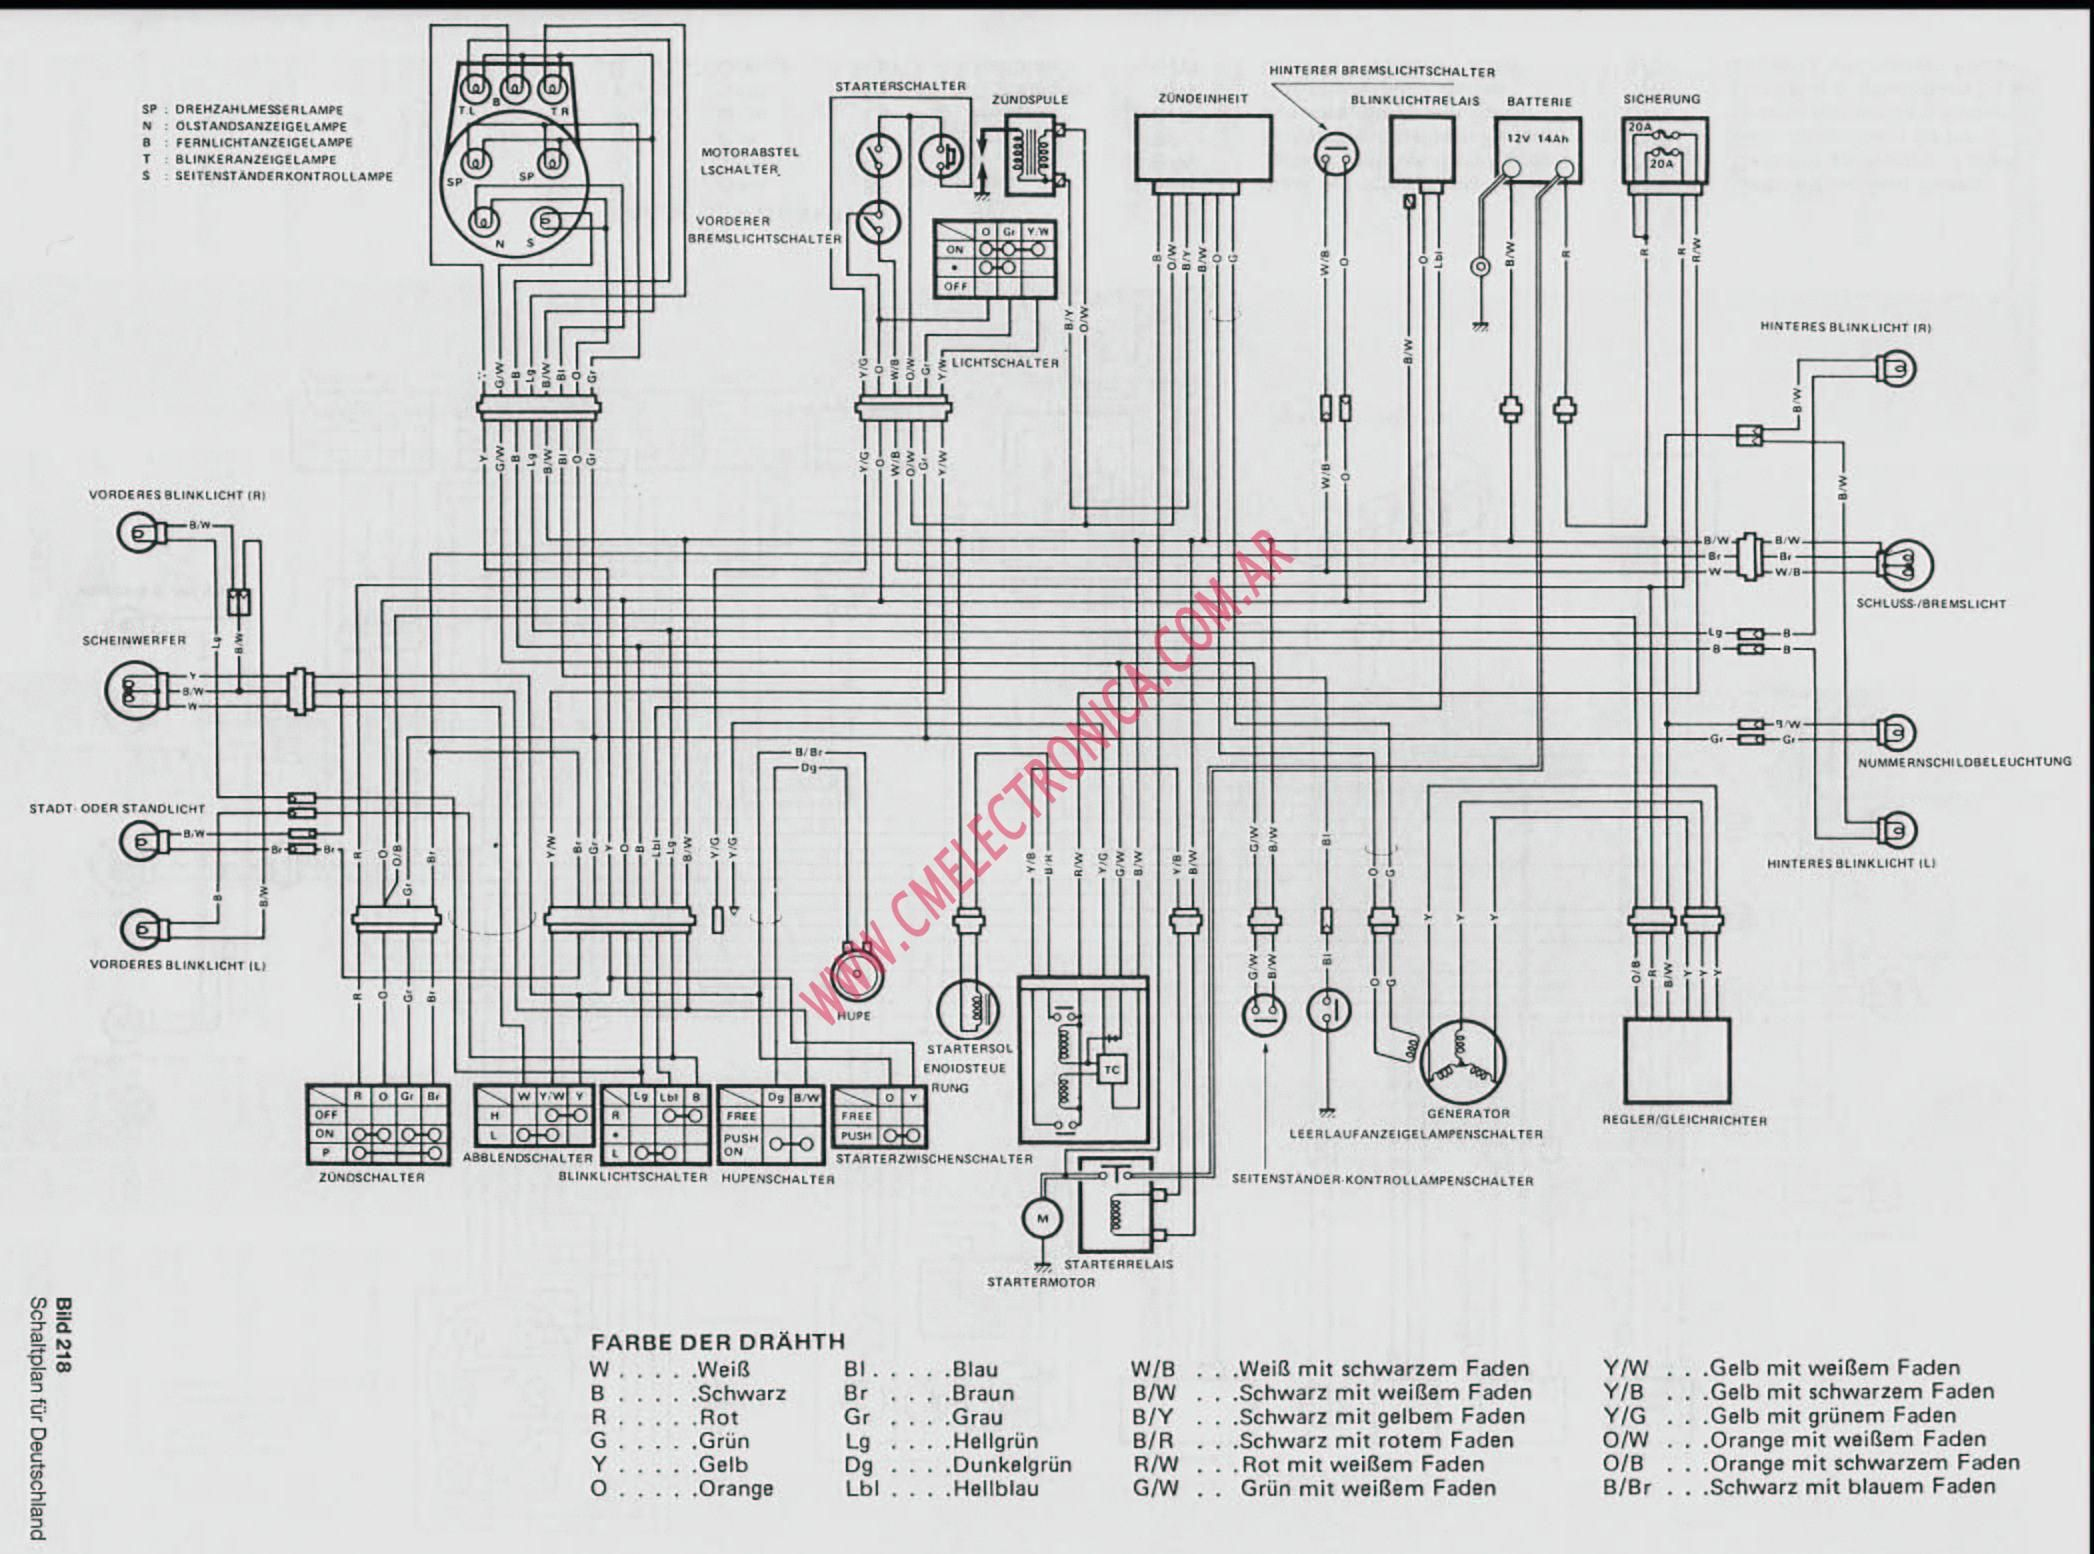 Suzuki Ax100 Wiring Diagram Electrical Schematics Motorcycle Diagrams Gt750 Dr 200 Comfortable Bandit